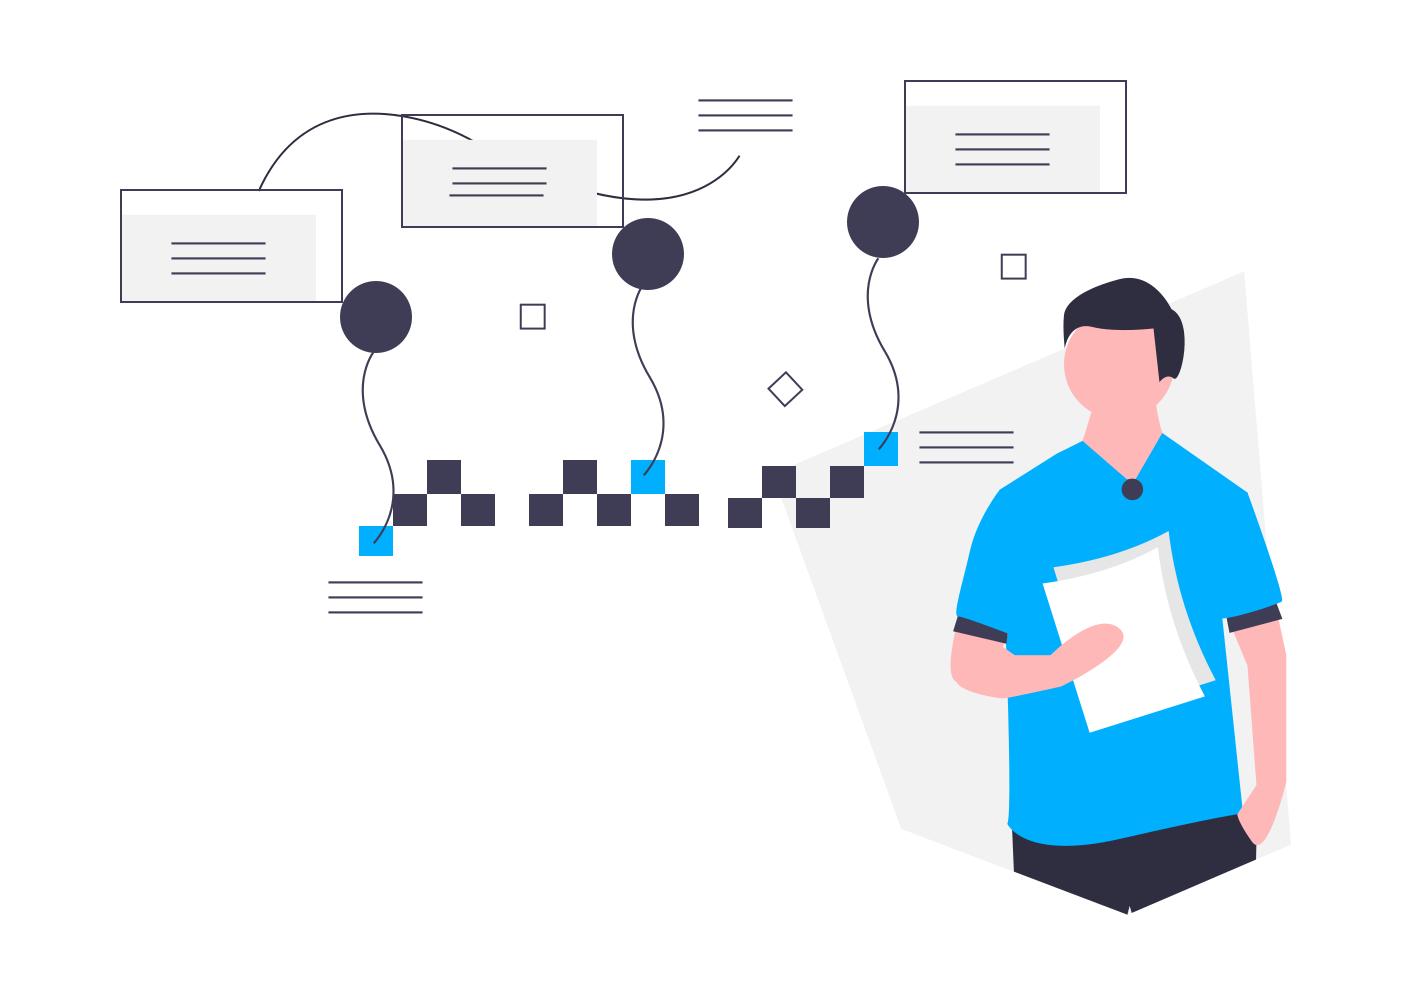 innova como startup capitulo 5